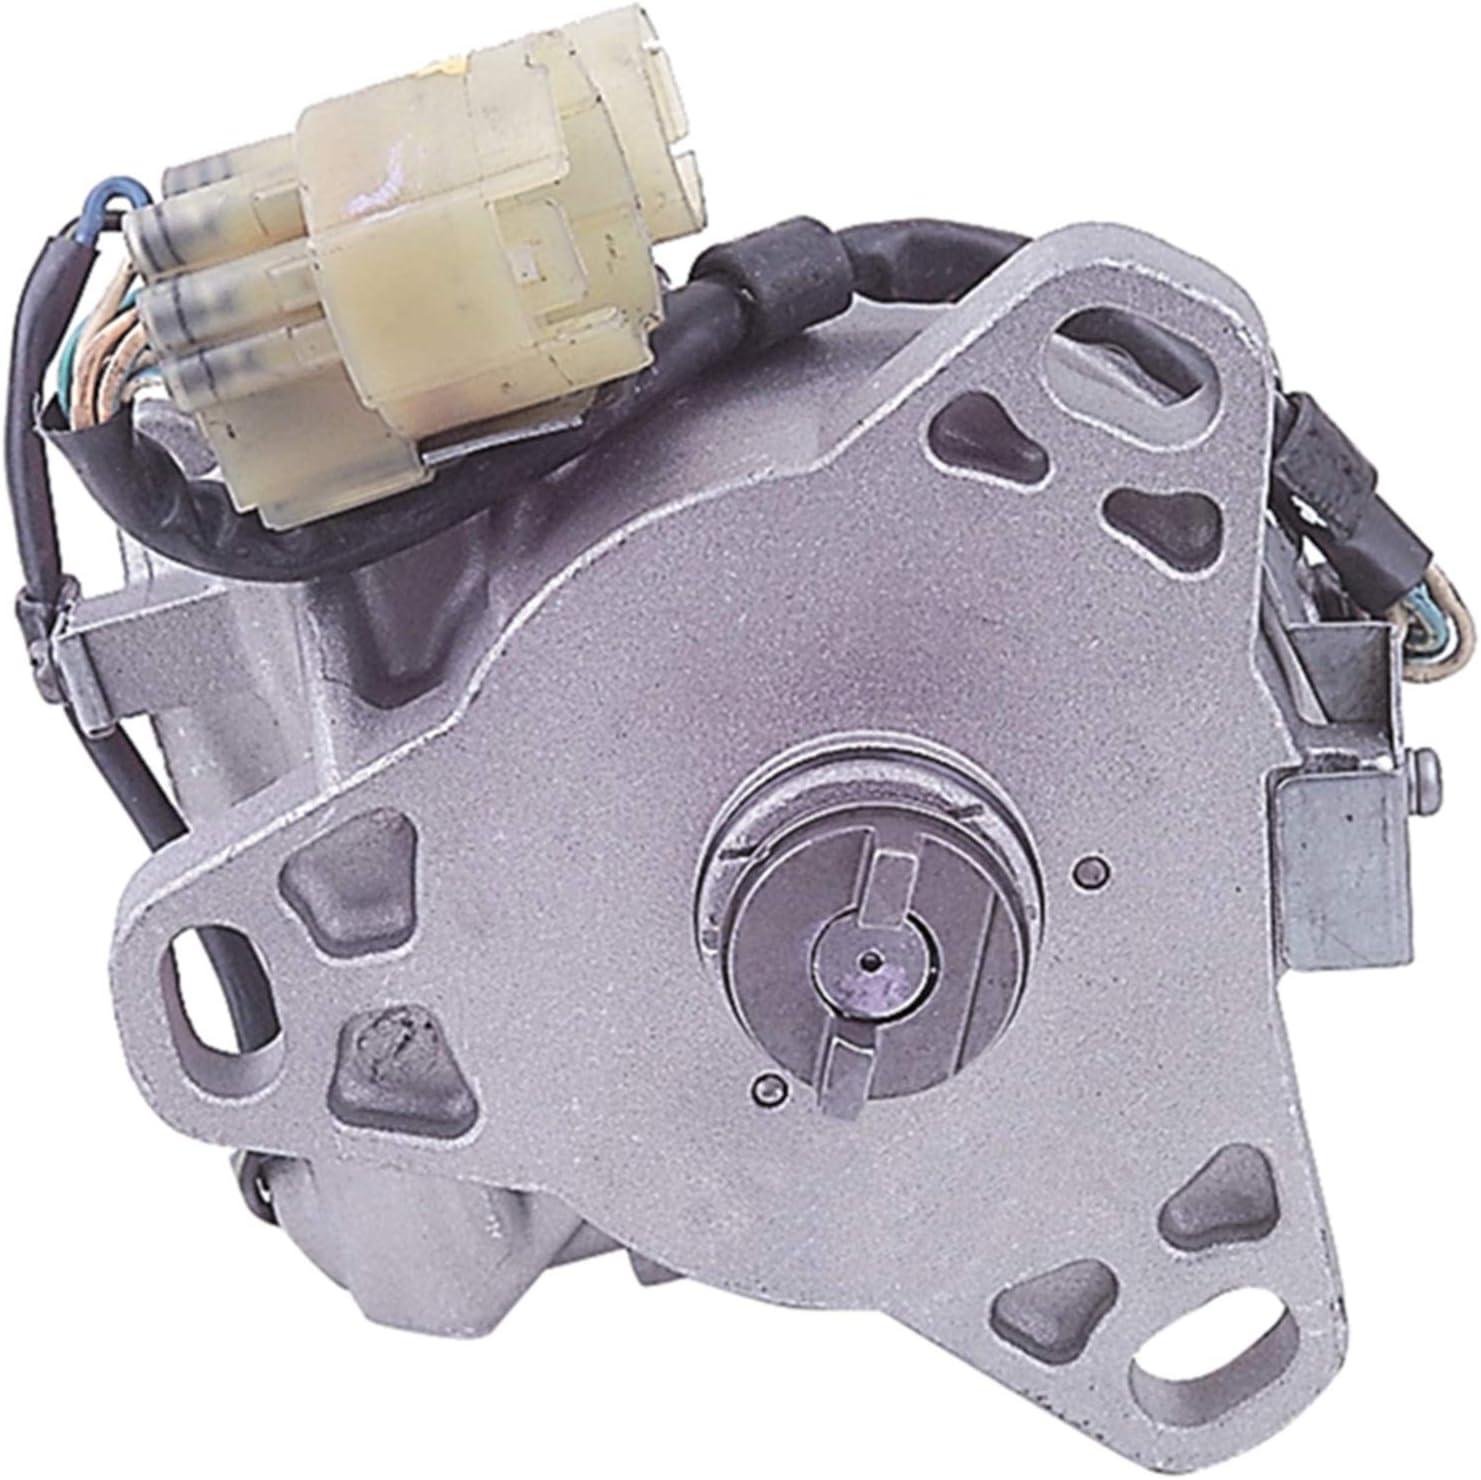 Cardone 31-17418 Remanufactured Import Distributor A1 Cardone 3117418AAF